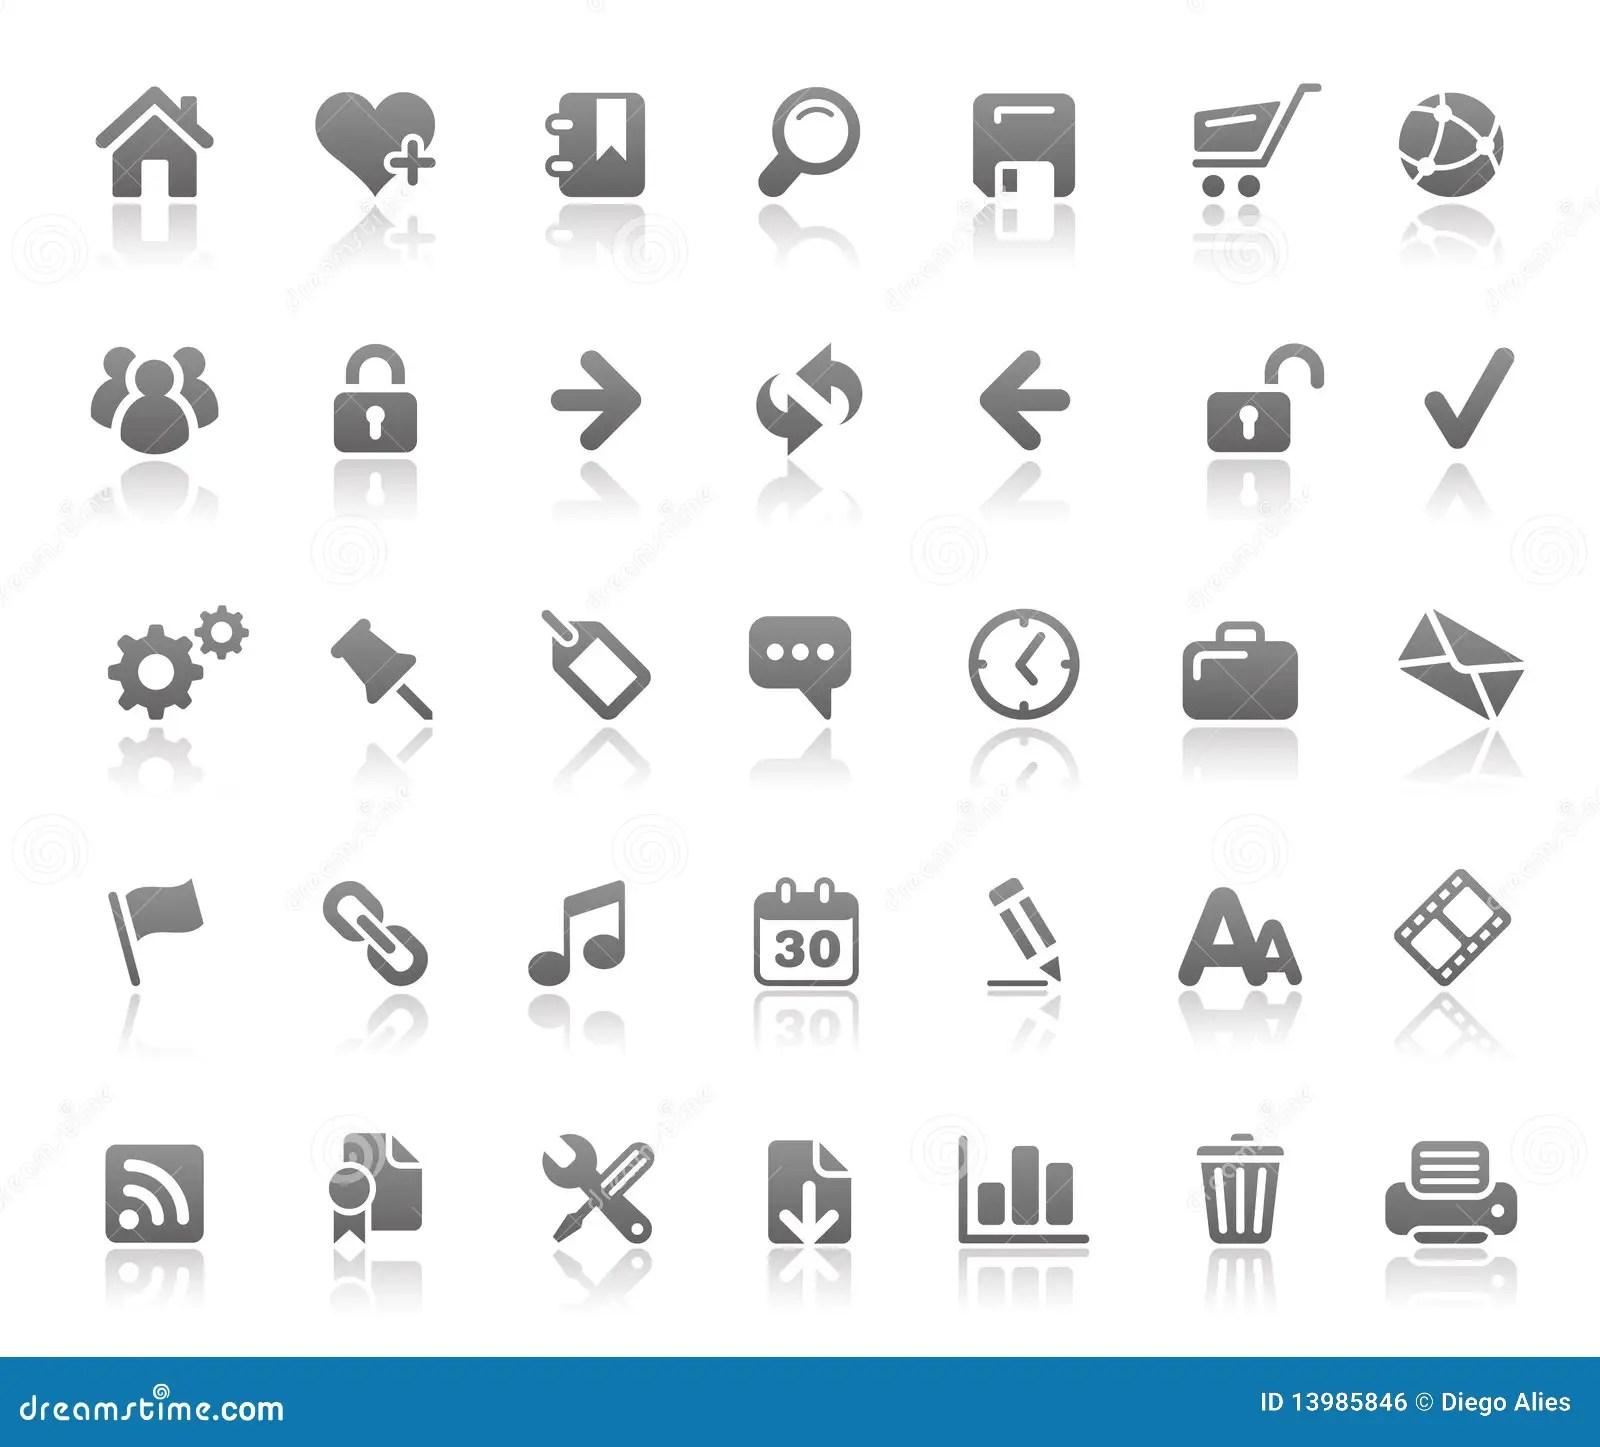 Website Amp Internet Icons Basics Series Royalty Free